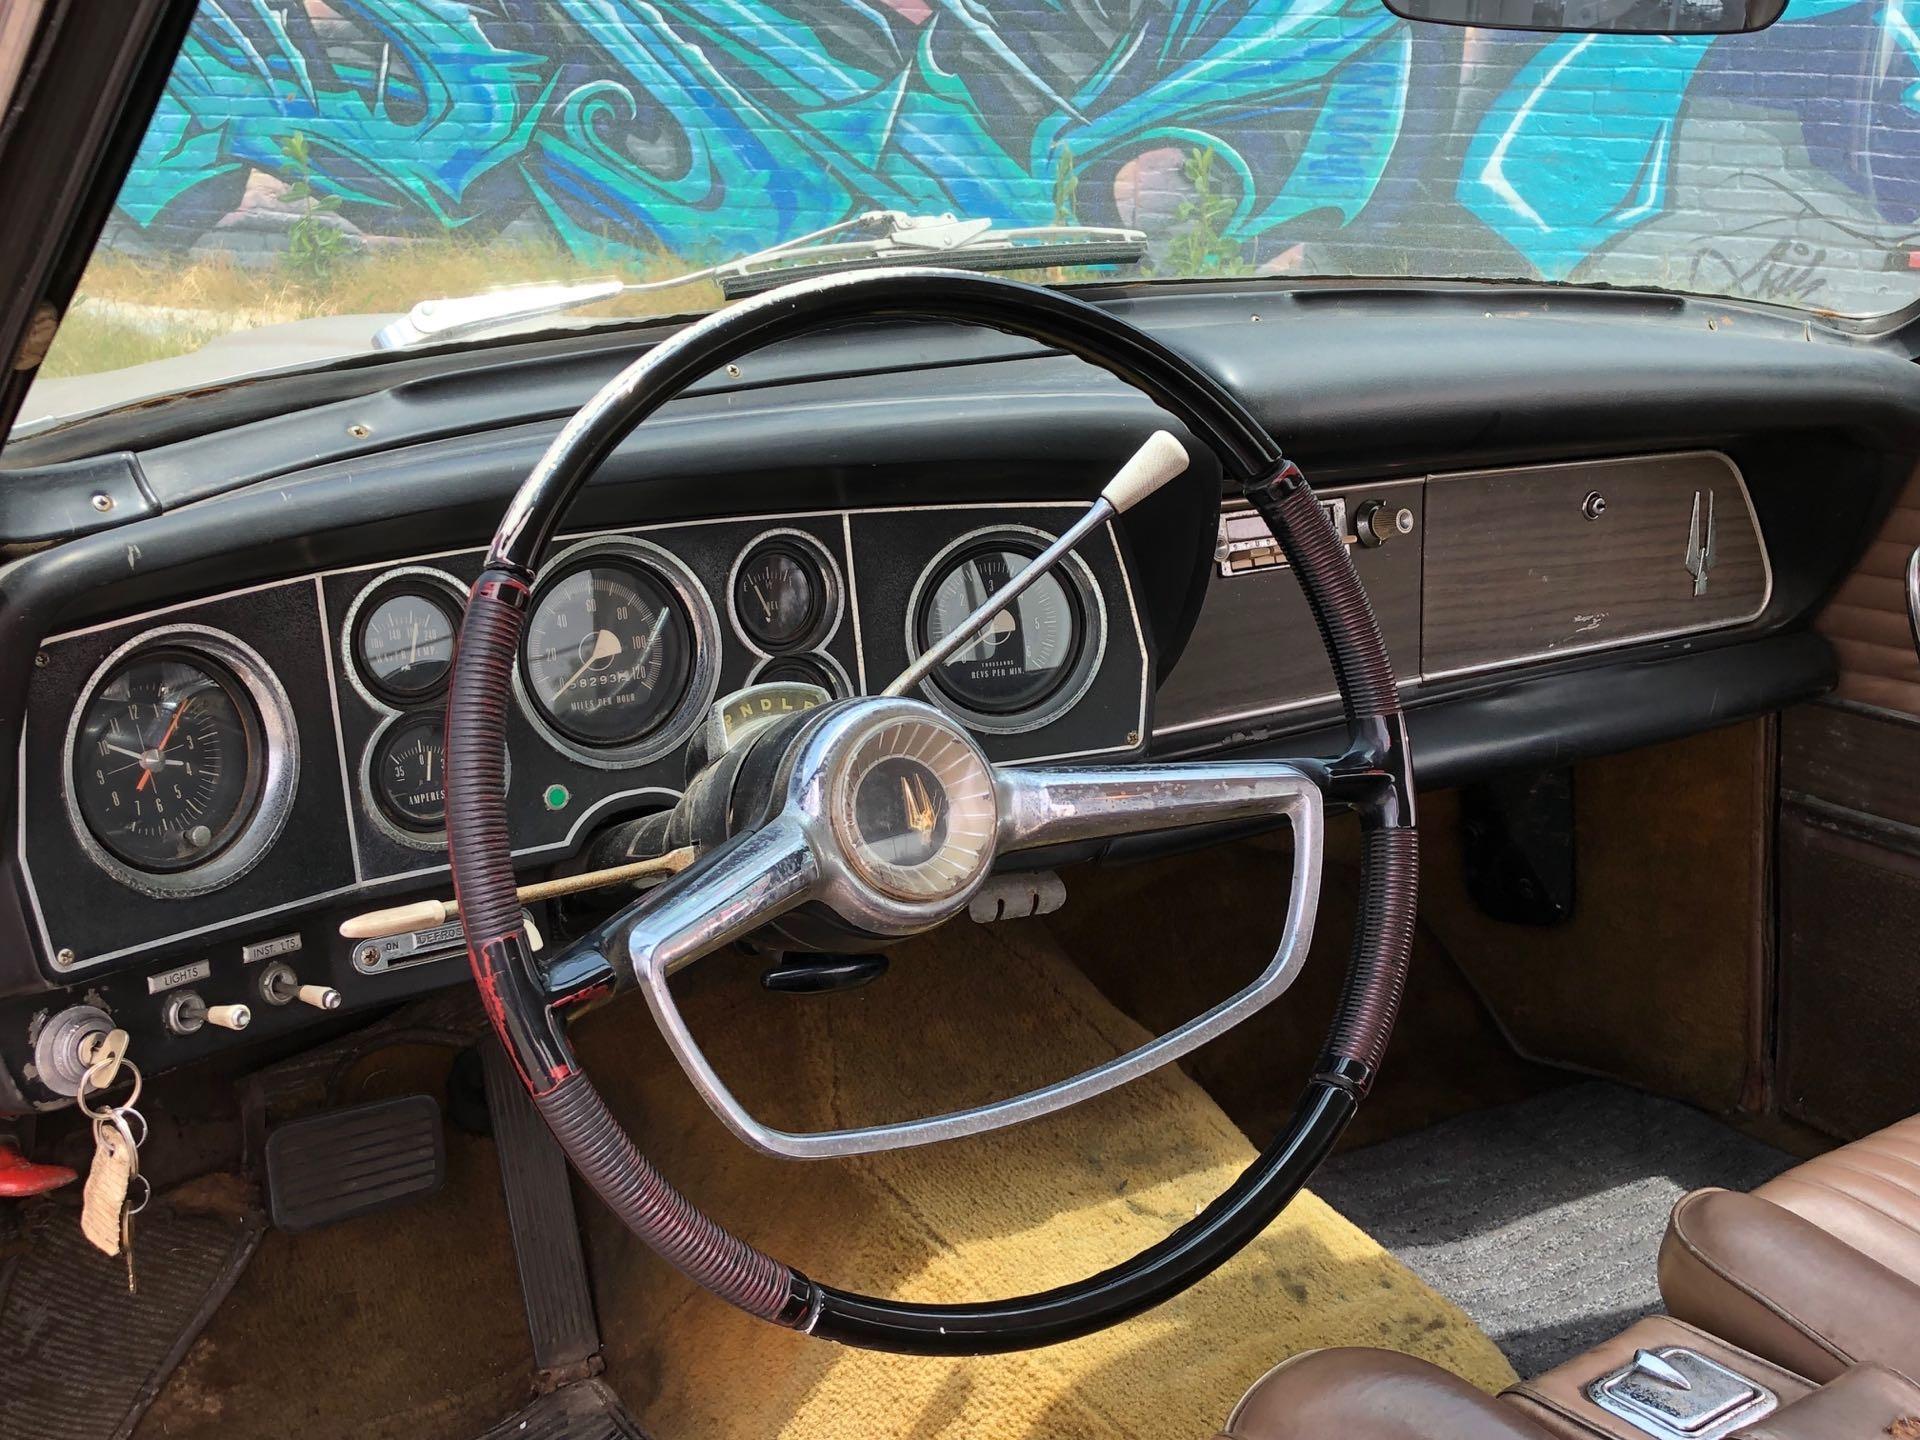 Used 1964 Studebaker Gran Turismo Hawk